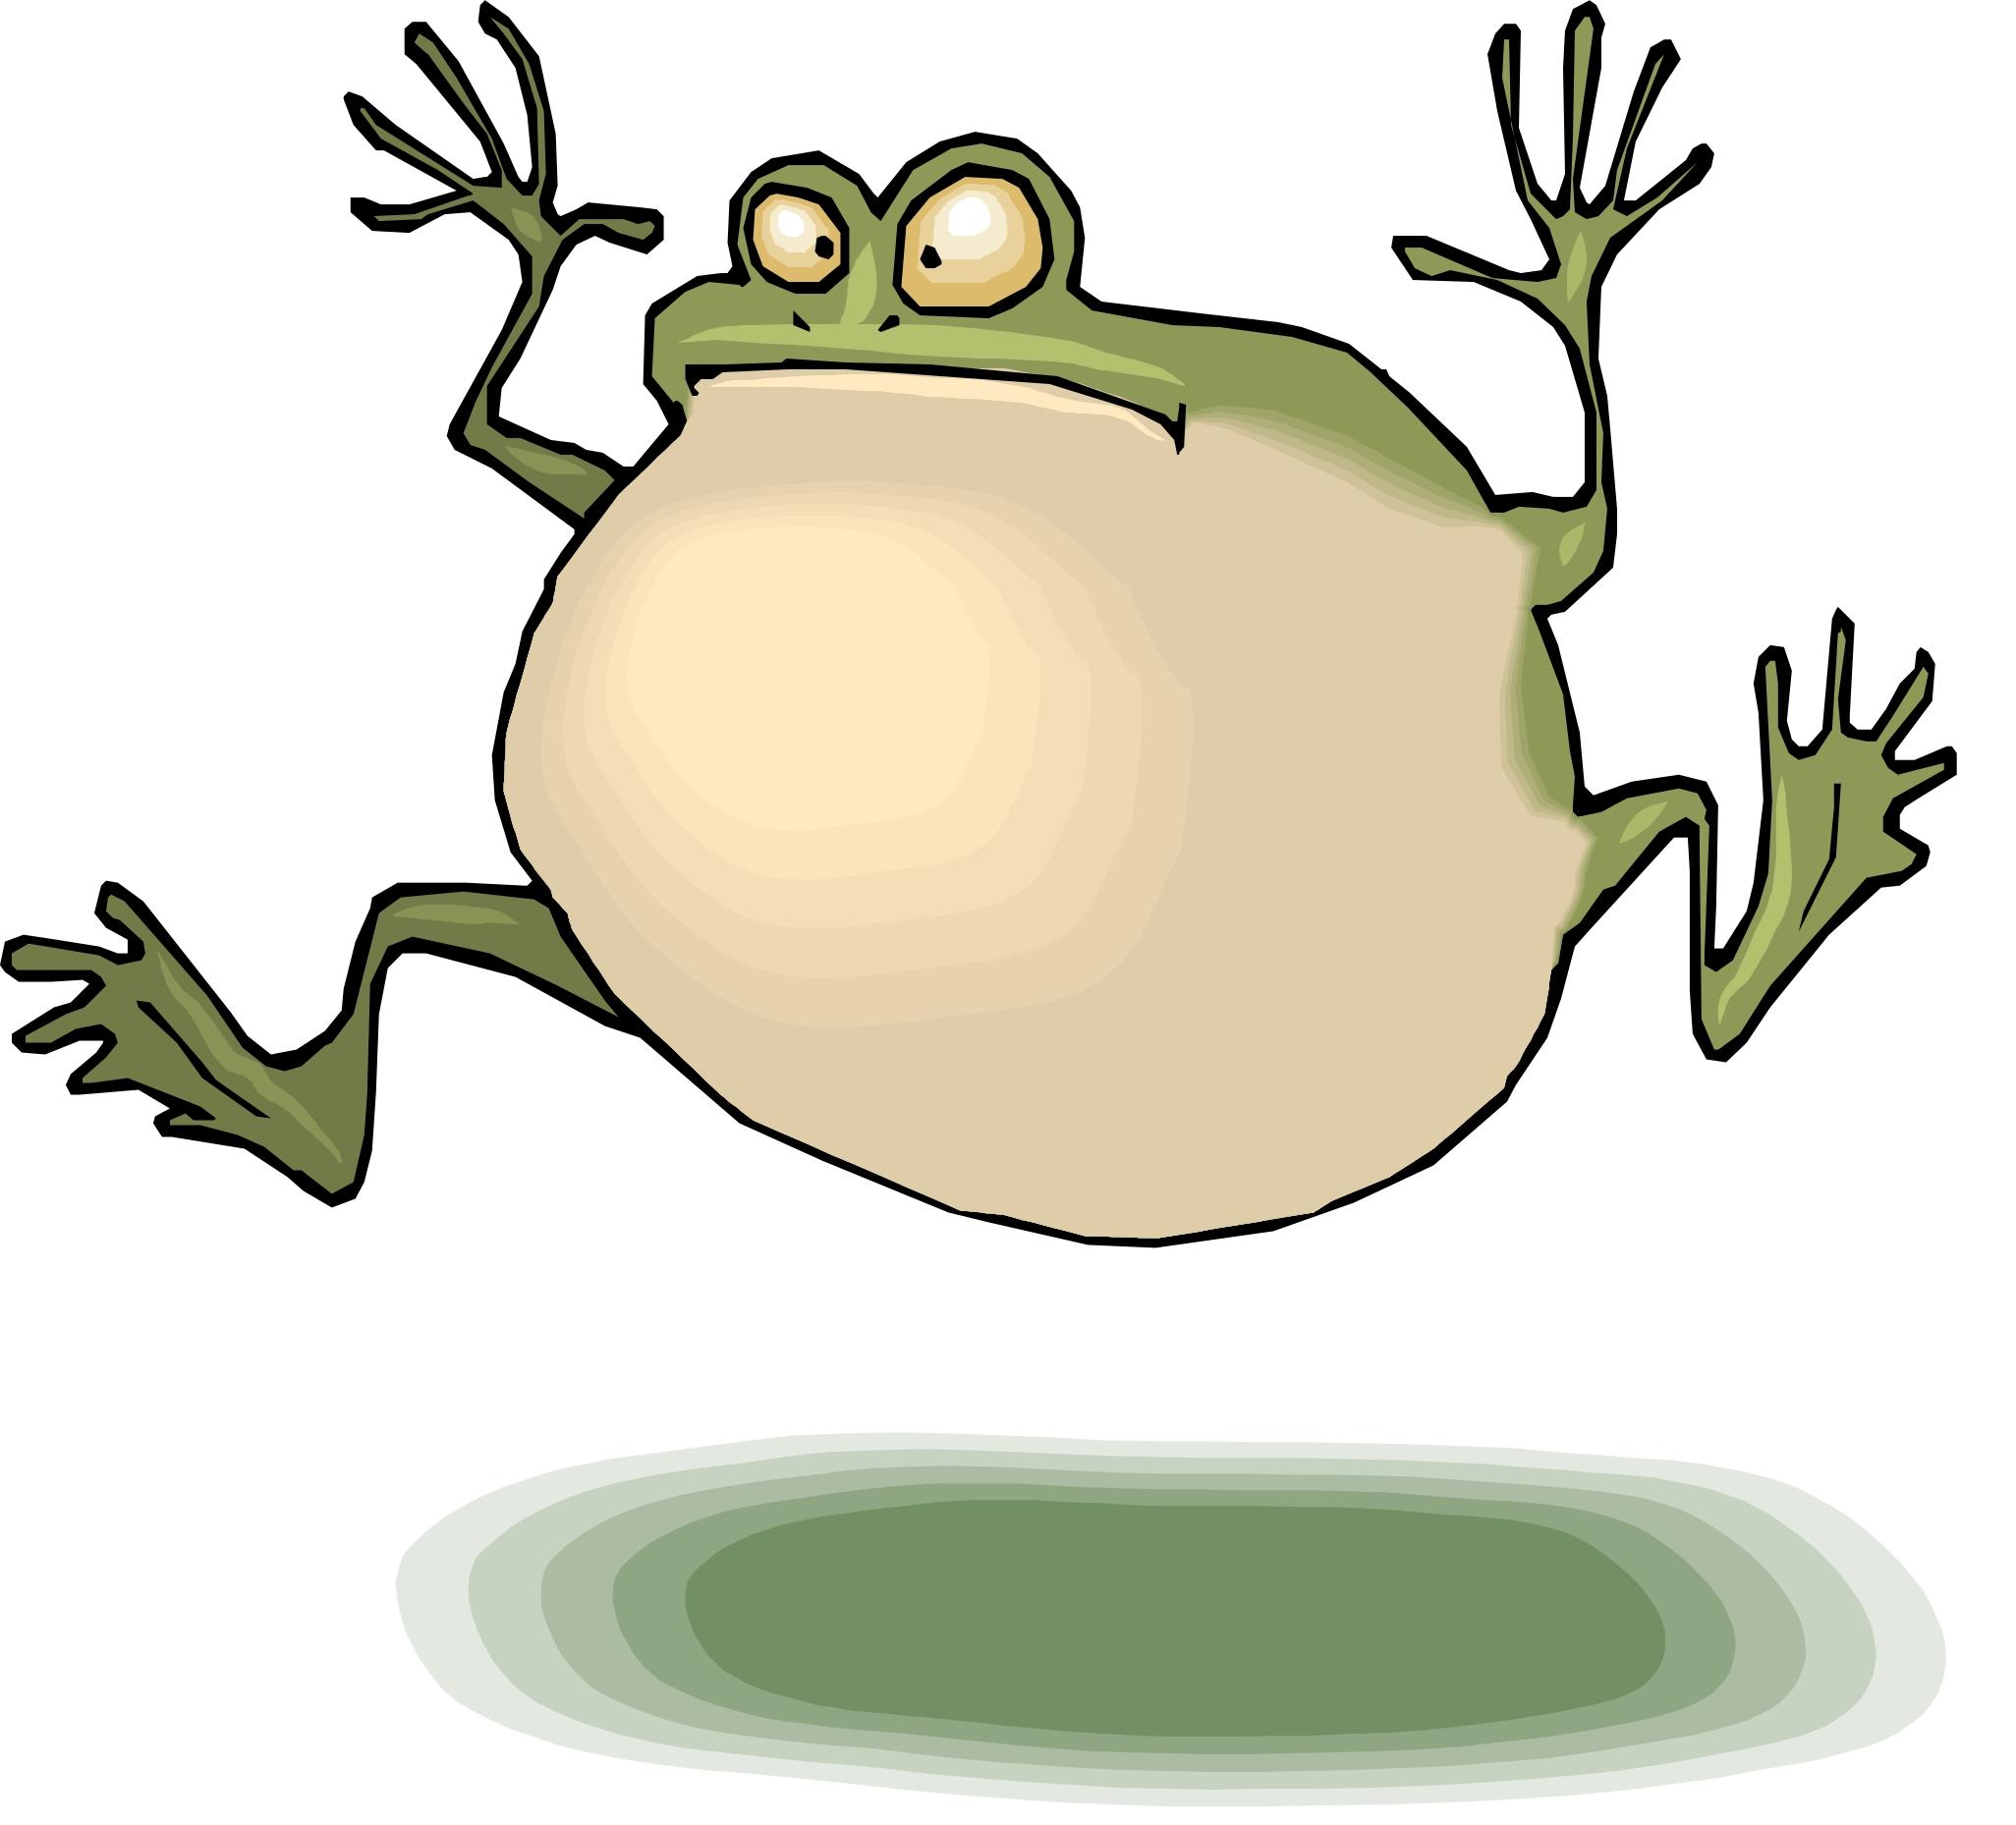 Jumping frog animation - photo#16